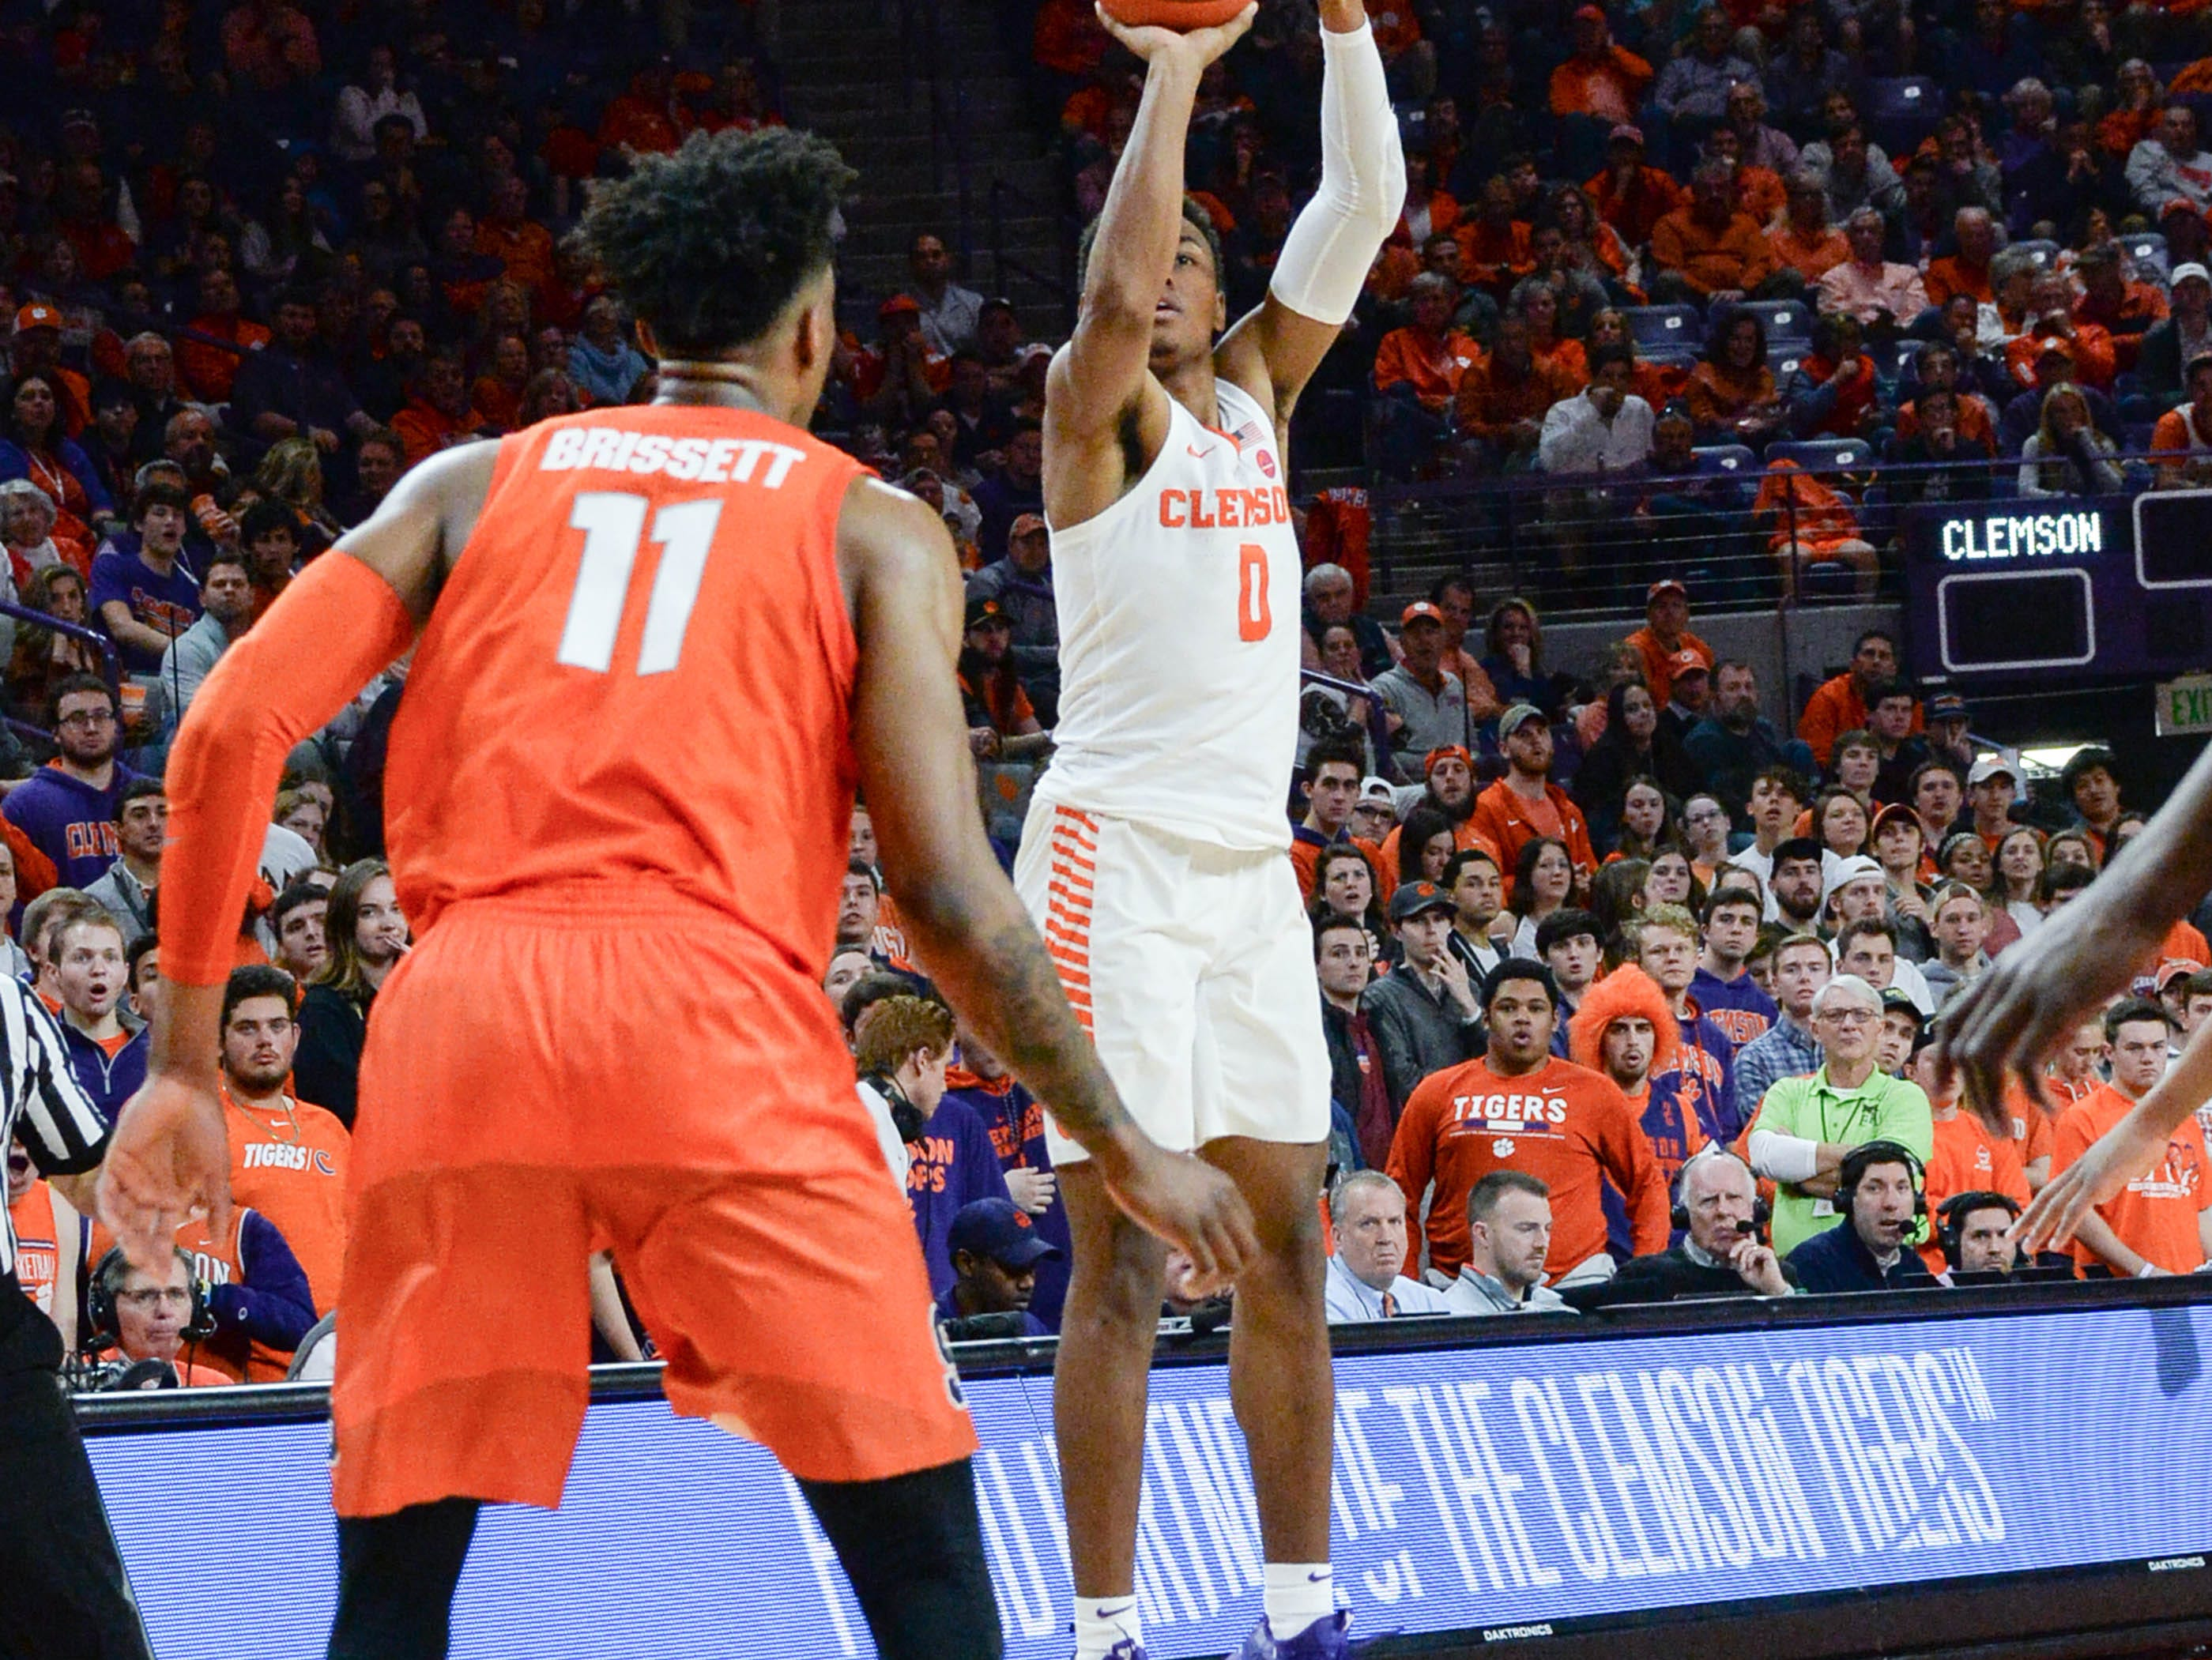 Clemson center Clyde Trapp (0) shoots near Syracuse forward Oshae Brissett(11) during the second half in Littlejohn Coliseum in Clemson Saturday, March 9, 2019.